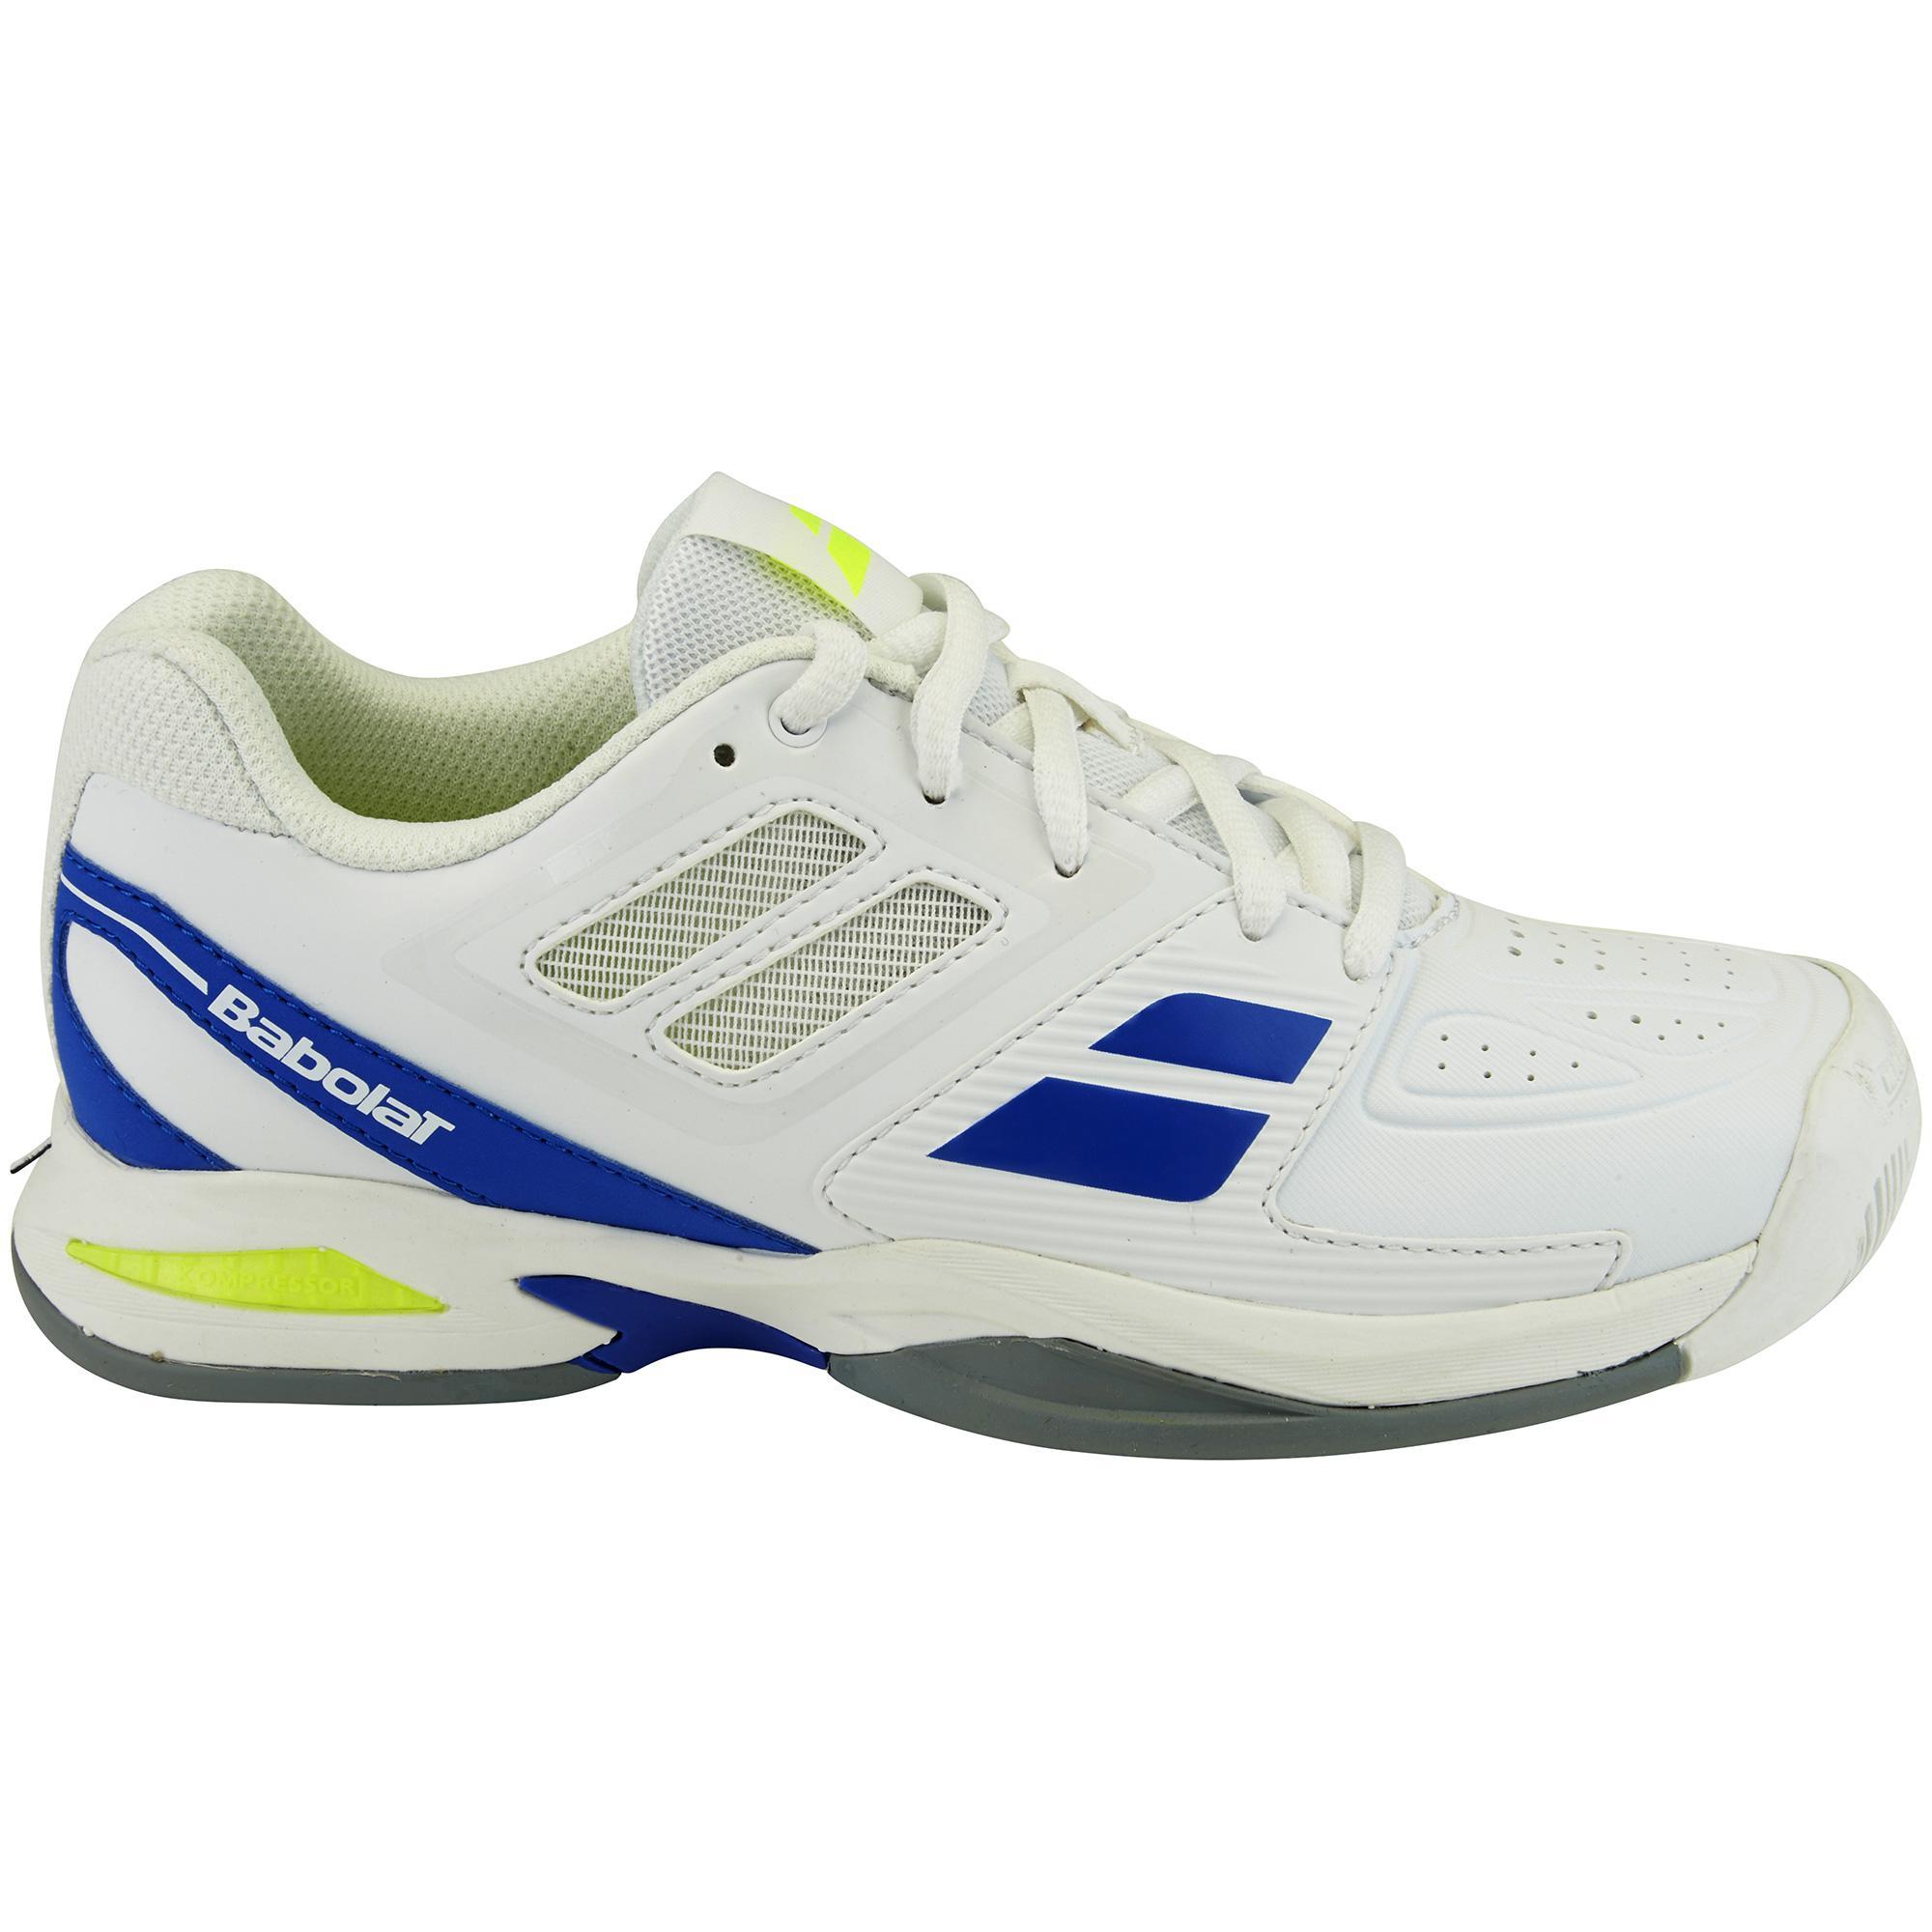 Babolat Kids Propulse Team All Court Tennis Shoes